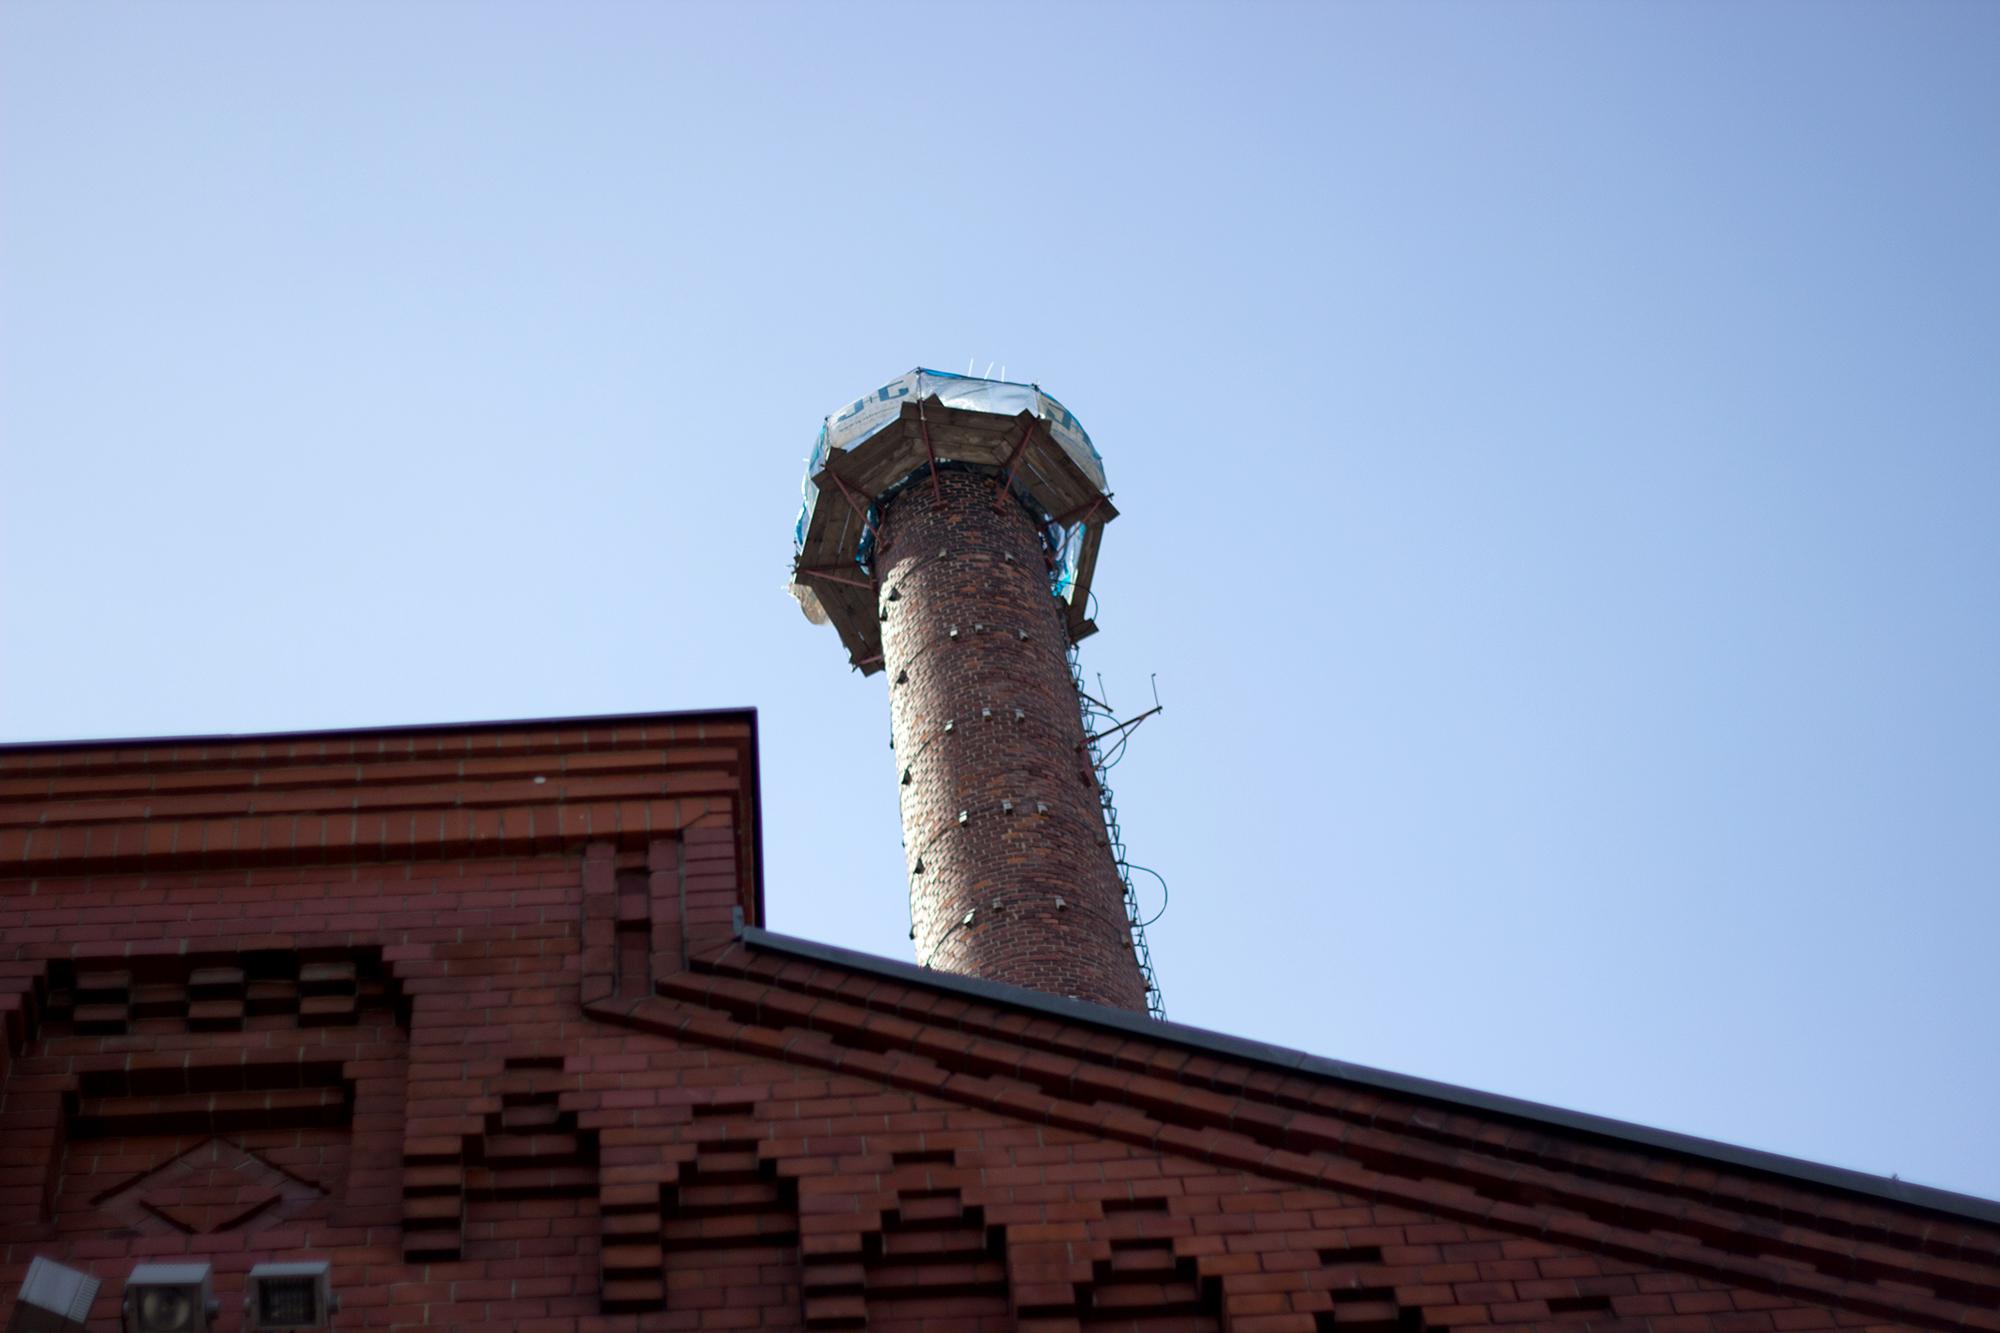 Alte Brauerei Berlin Turm